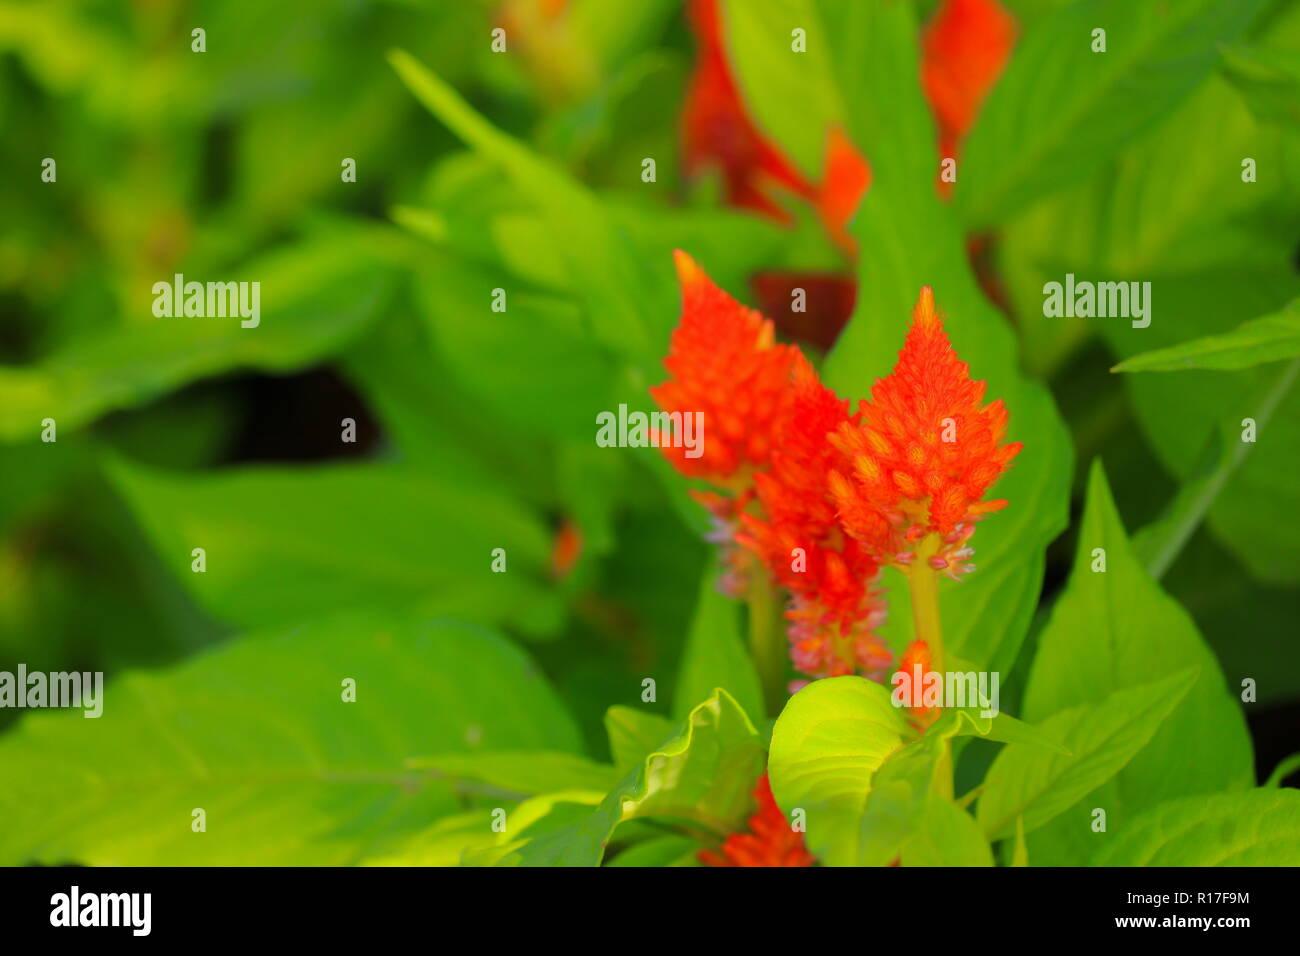 orange plumed cockscomb flower or Celosia argentea beautiful in the garden Stock Photo